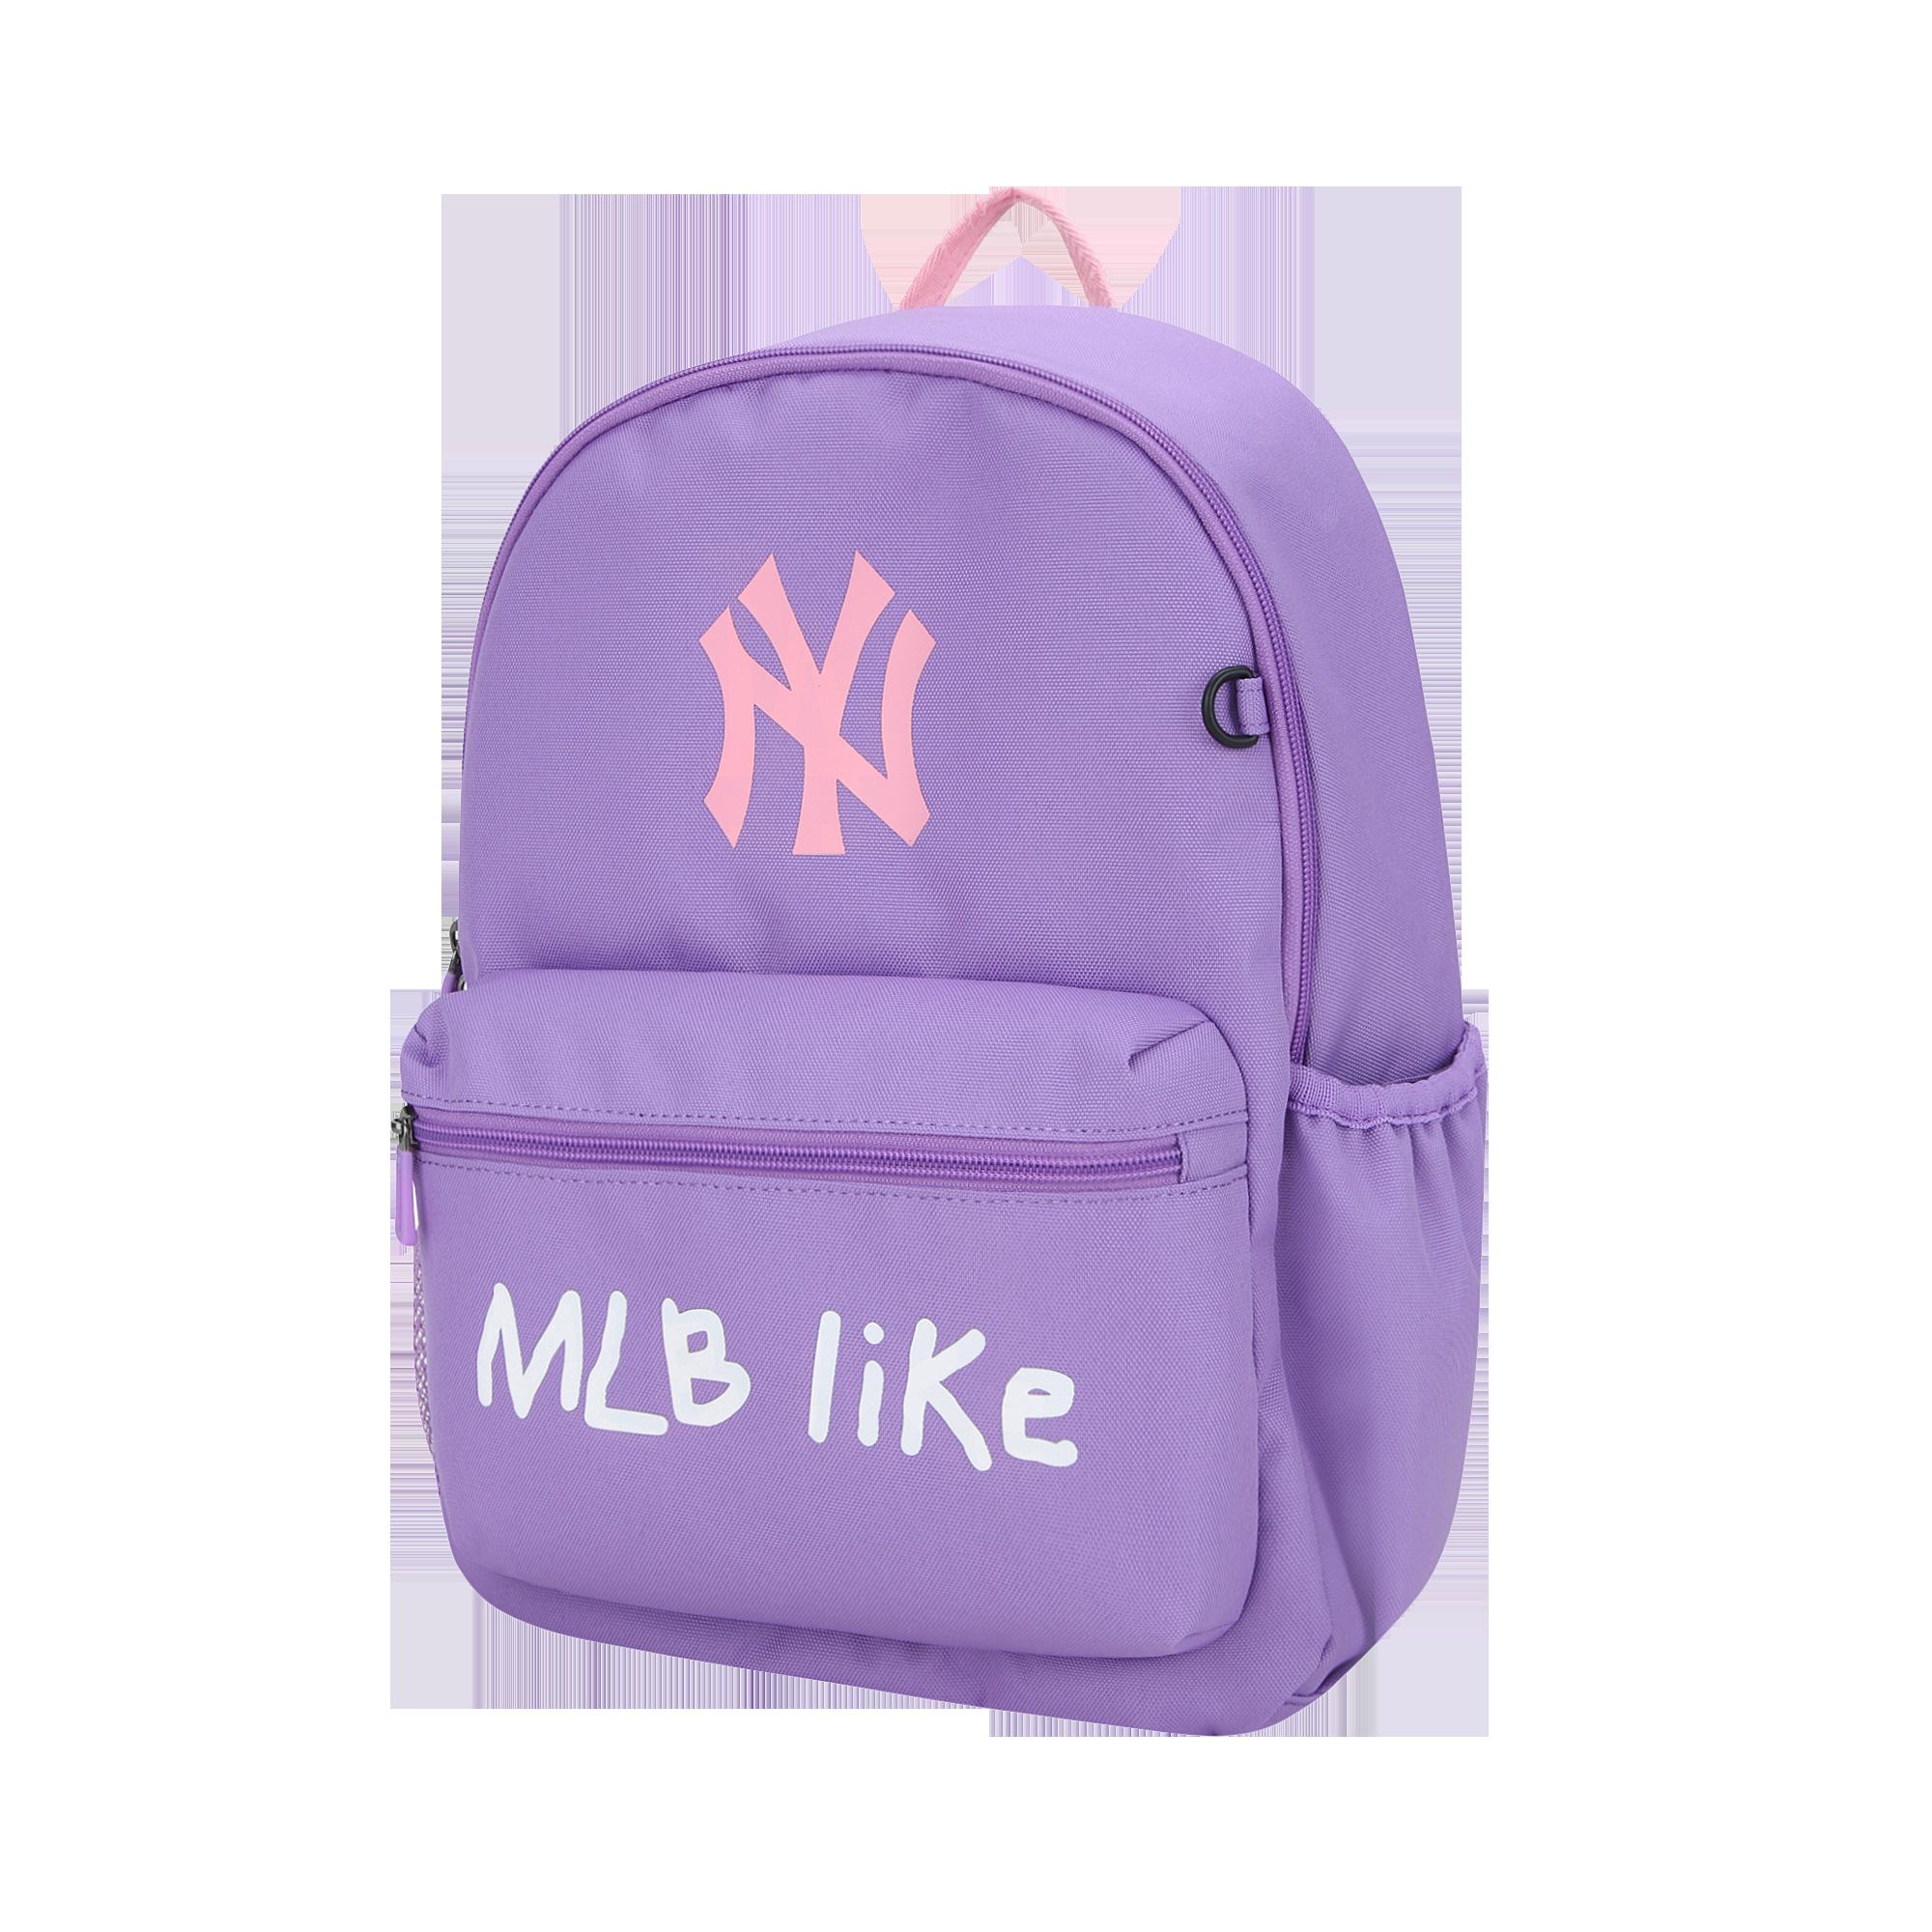 MLB LIKE : 라이크 원포켓 백팩 뉴욕양키스